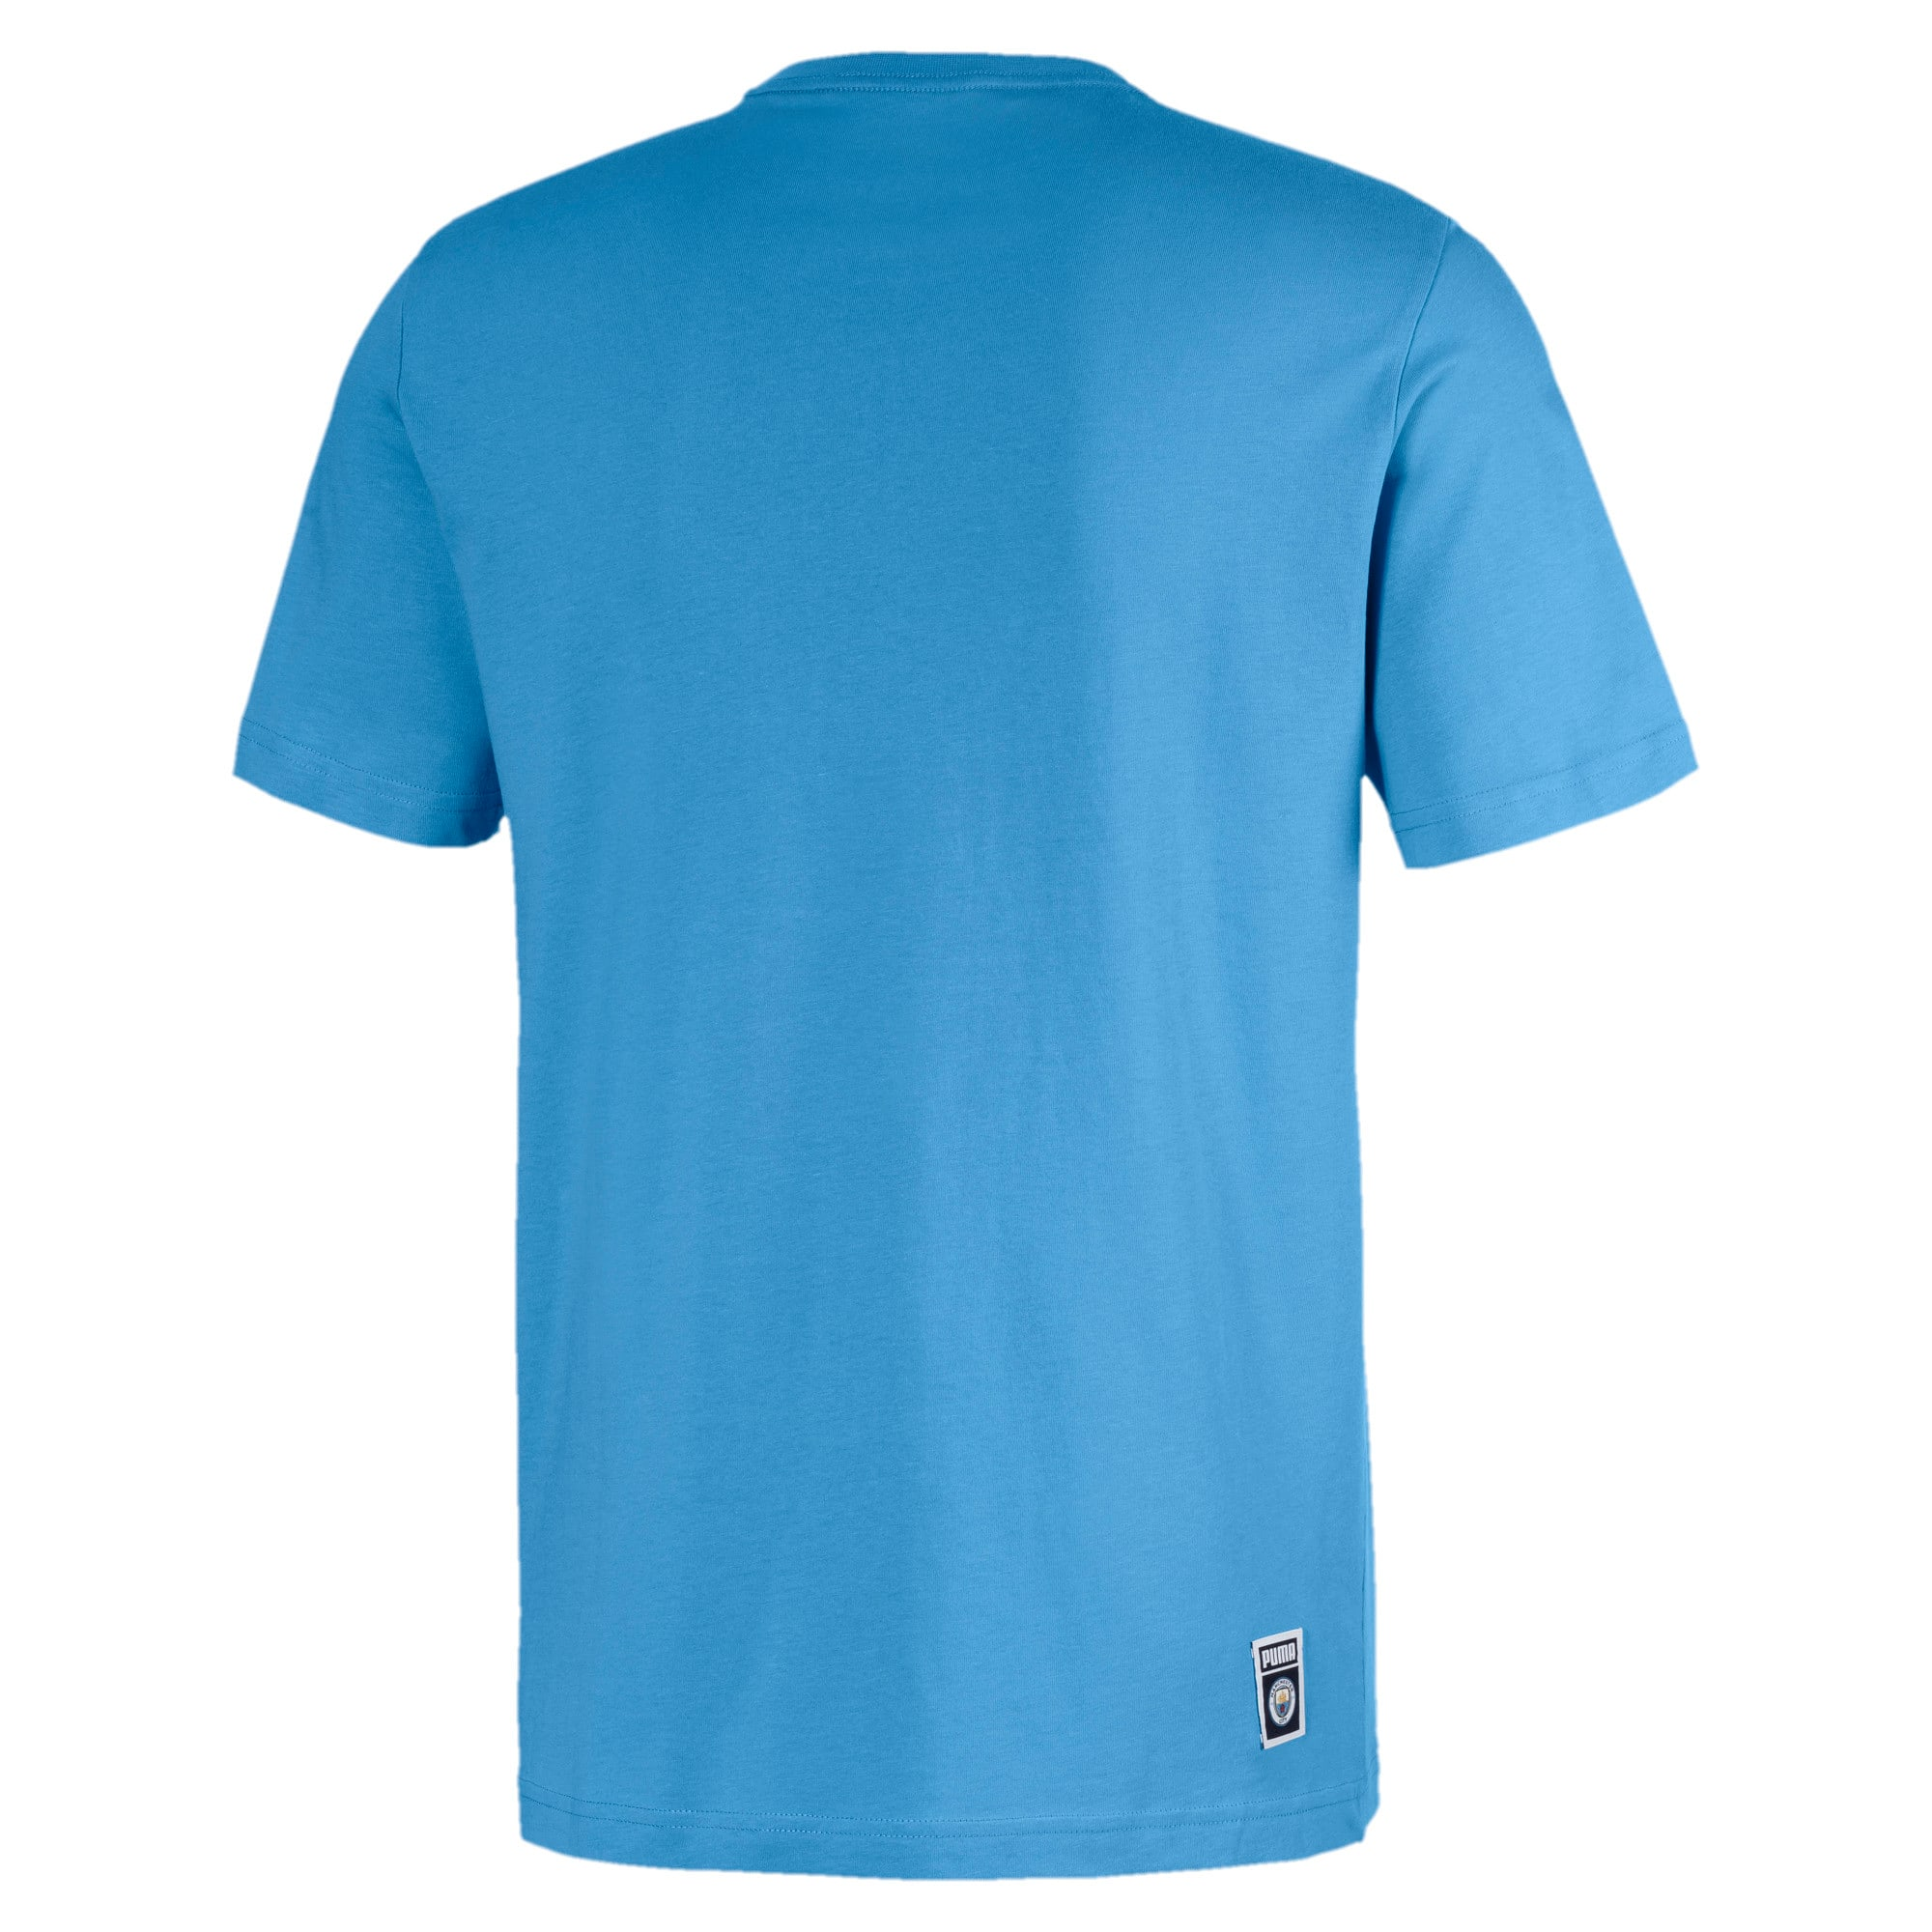 Thumbnail 2 of Essentials Short Sleeve Men's Tee, Team Light Blue-Puma white, medium